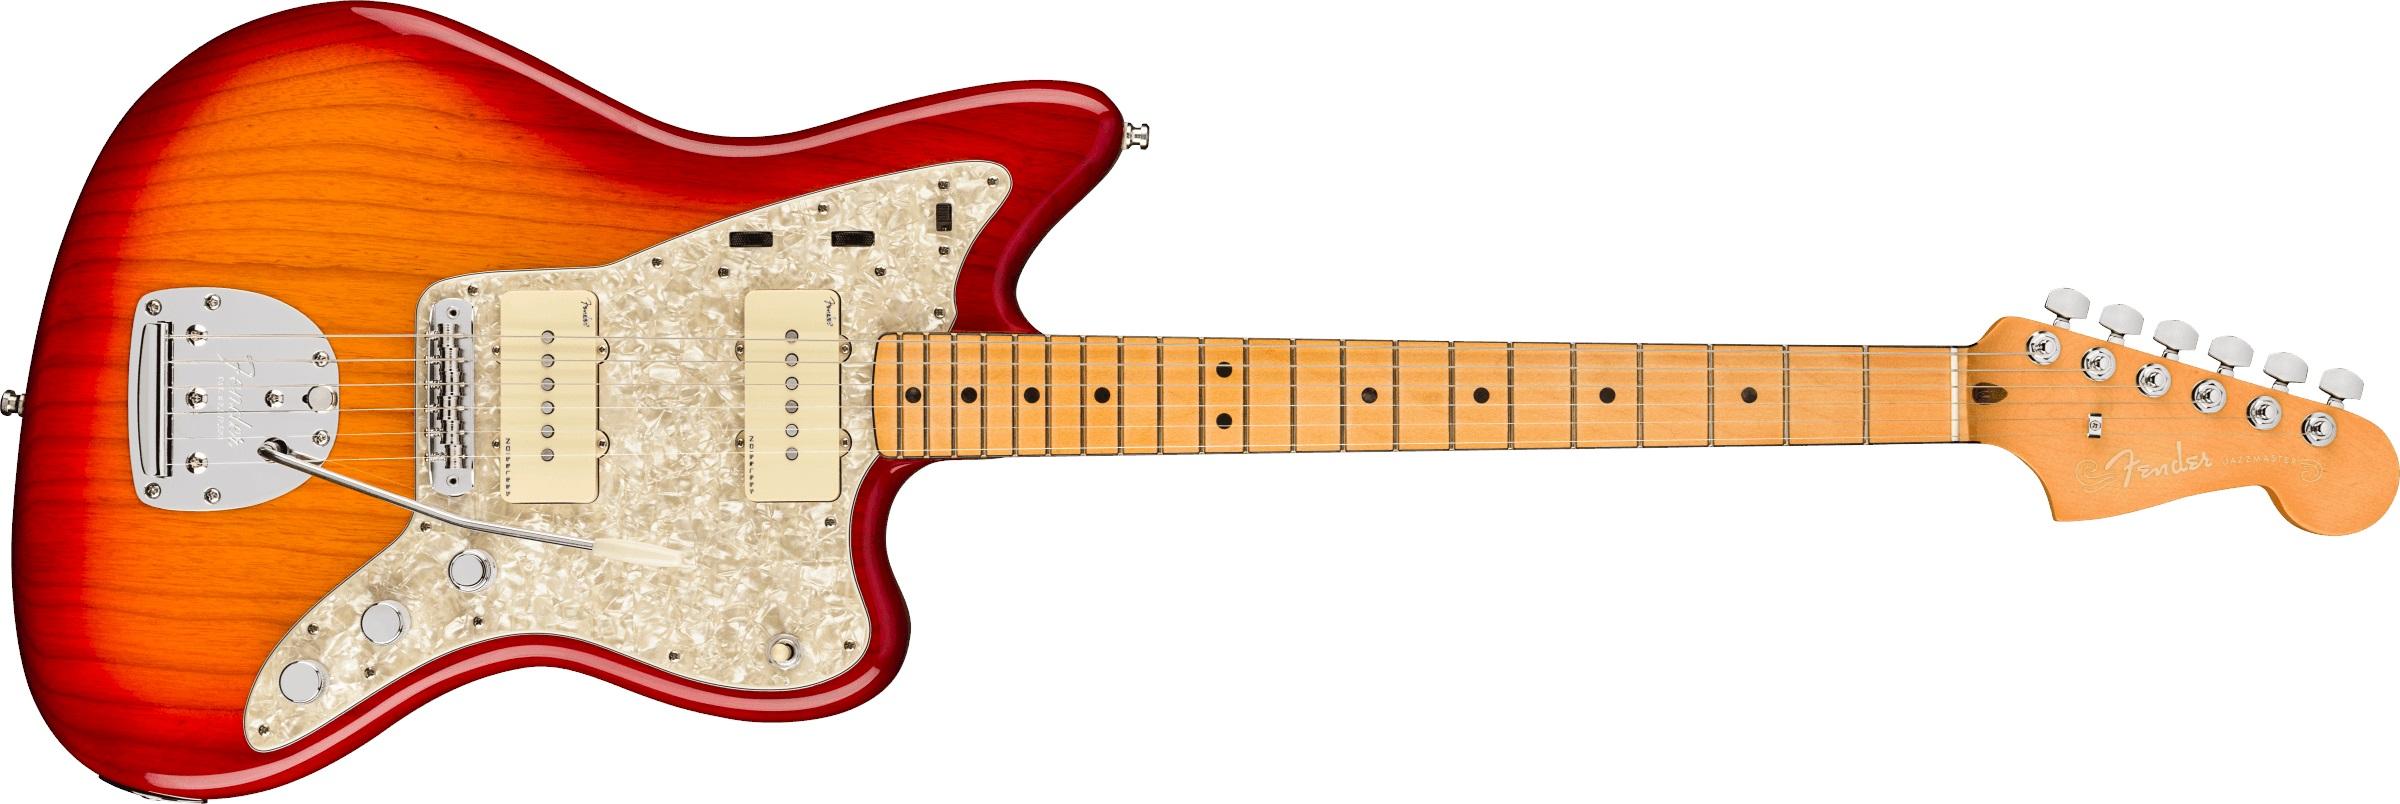 Fender American Ultra Jazzmaster MN PRB